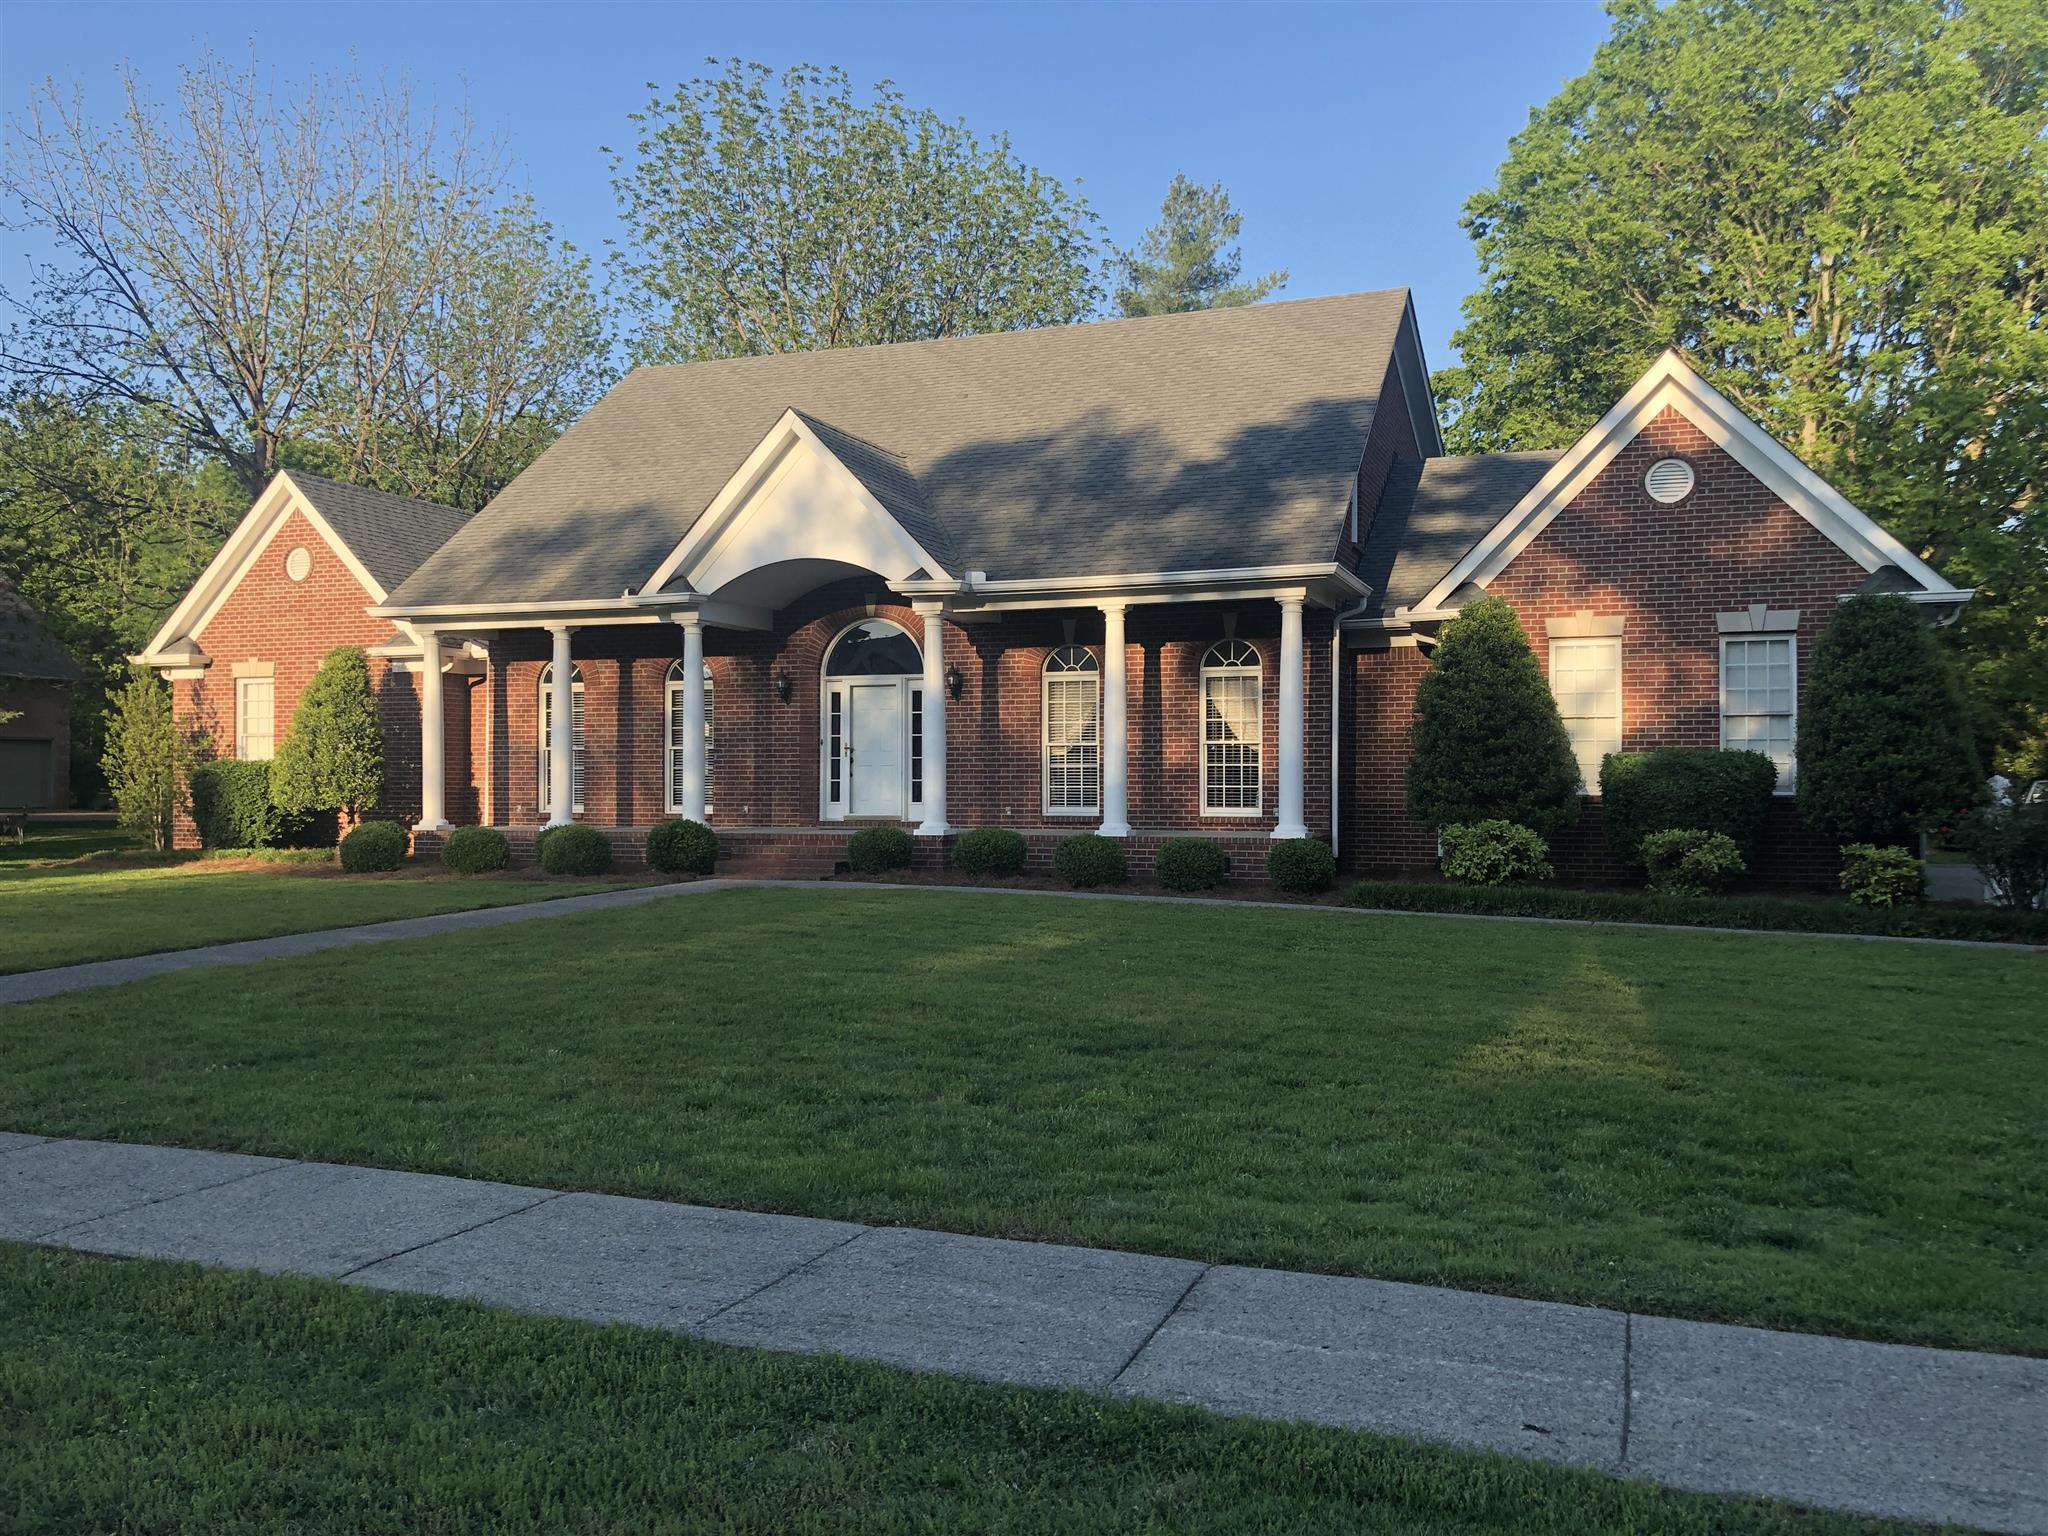 1046 Grassland Chase Dr, Gallatin, TN 37066 - Gallatin, TN real estate listing